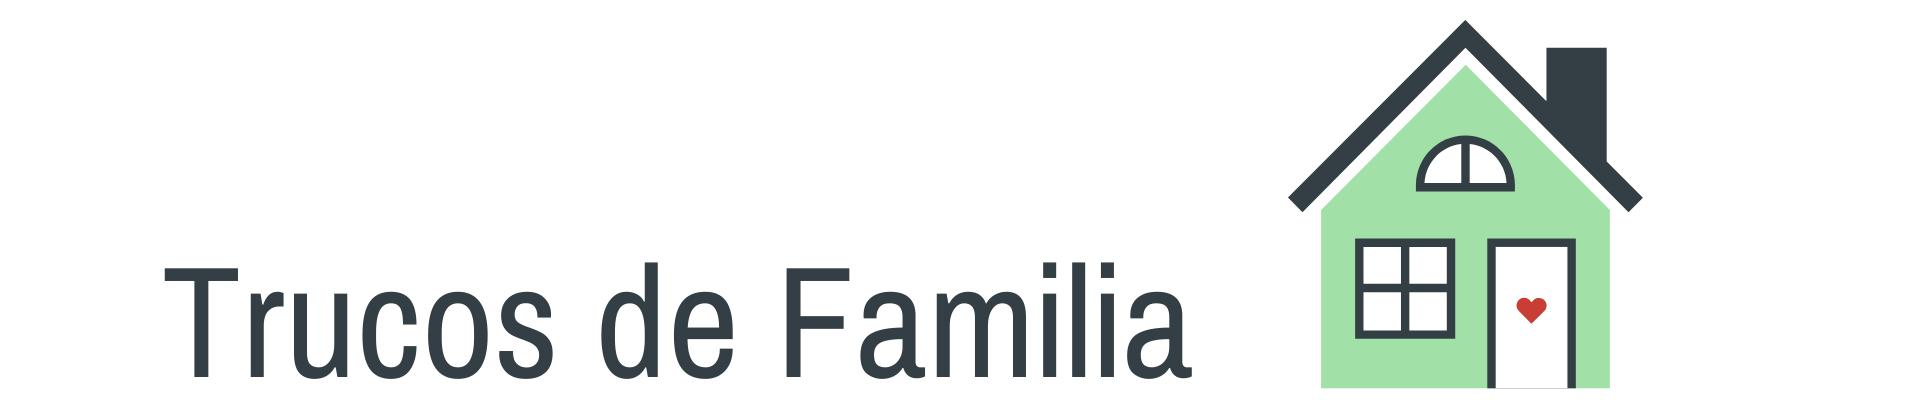 Trucos de Familia